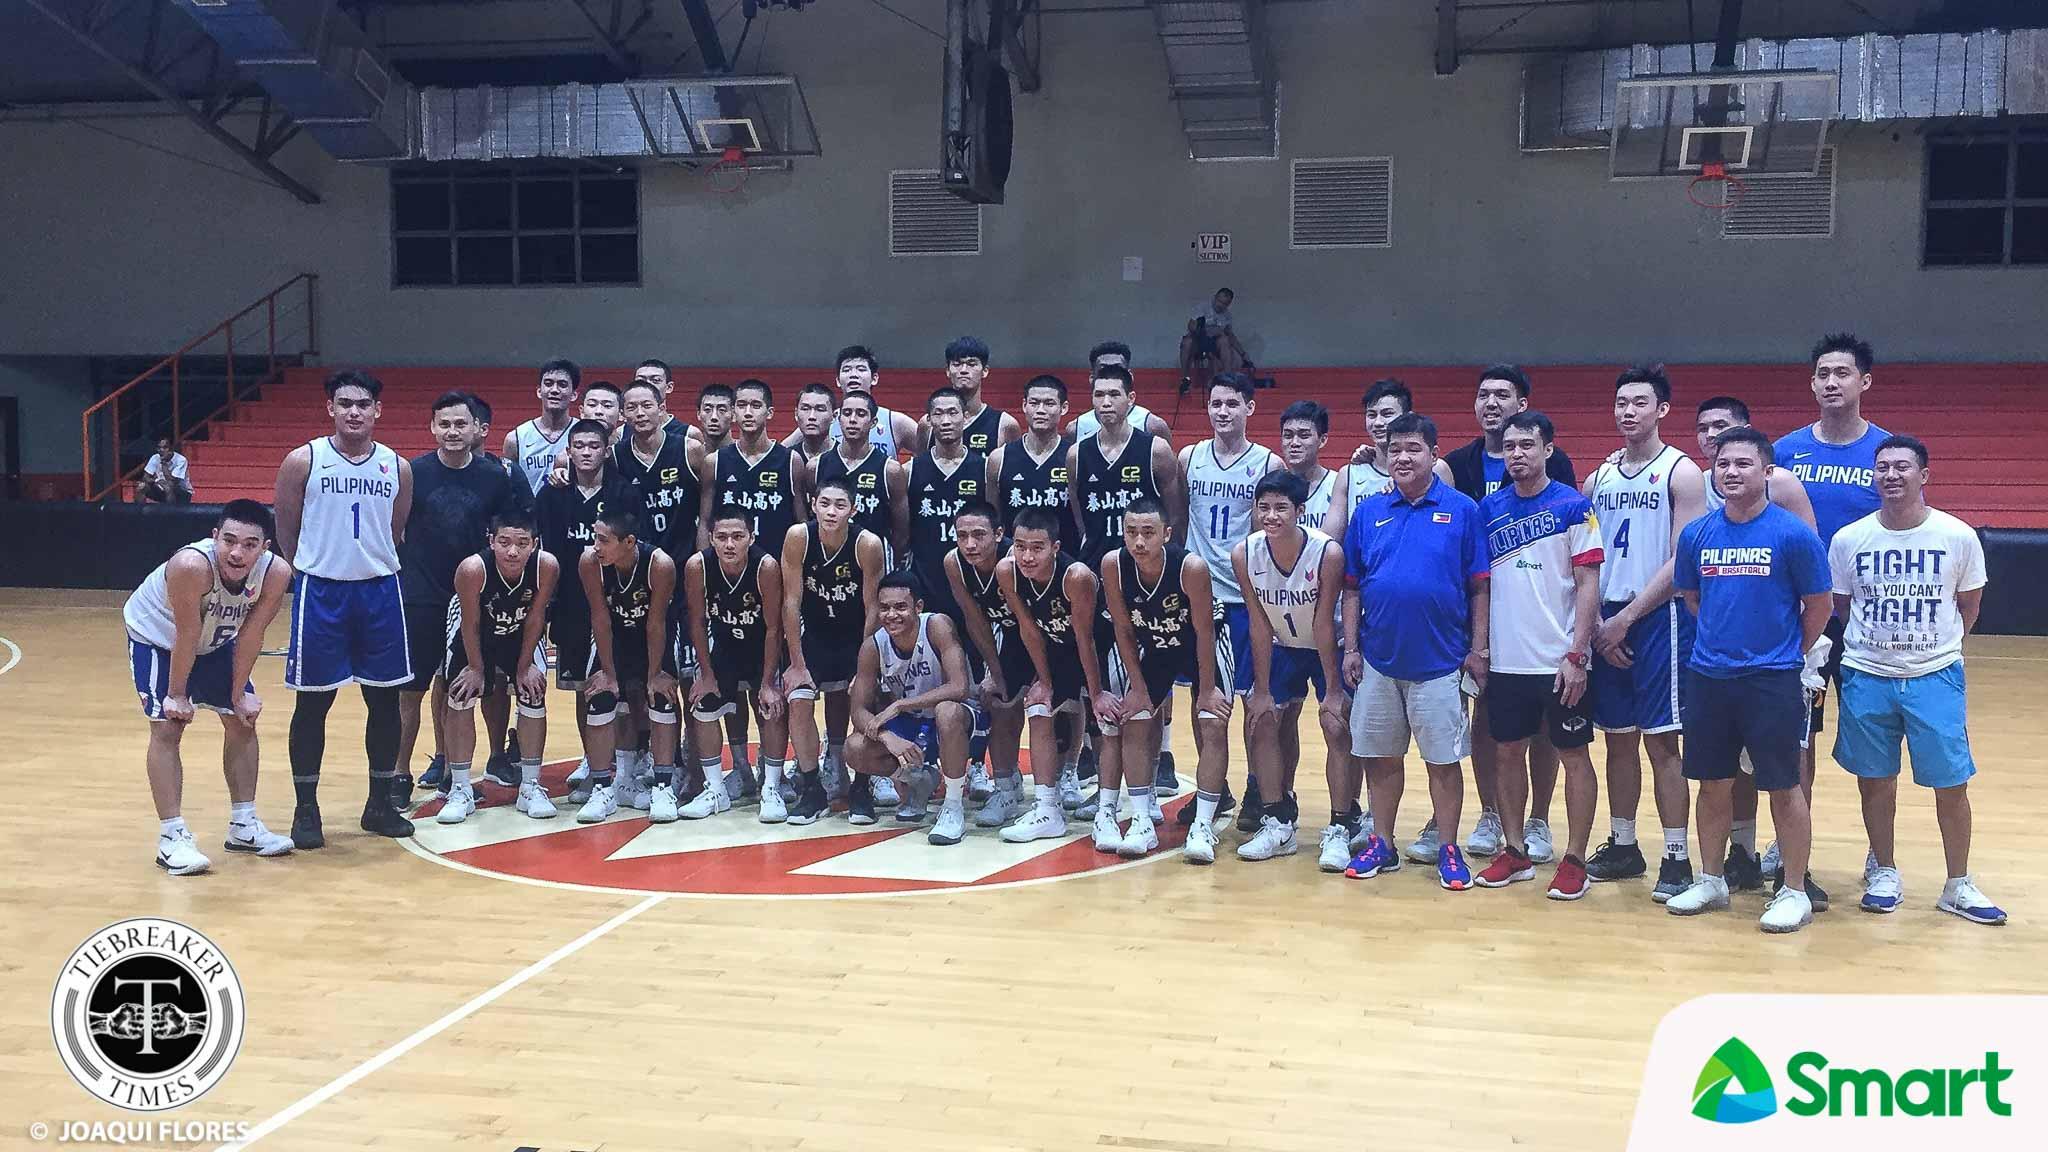 Tiebreaker Times Batang Gilas helps out Taiwan public high school Basketball Gilas Pilipinas News  Tai Shan Senior High School Josh Reyes Chen Zhizhong Batang Gilas 2018 FIBA Under-18 Asian Championship